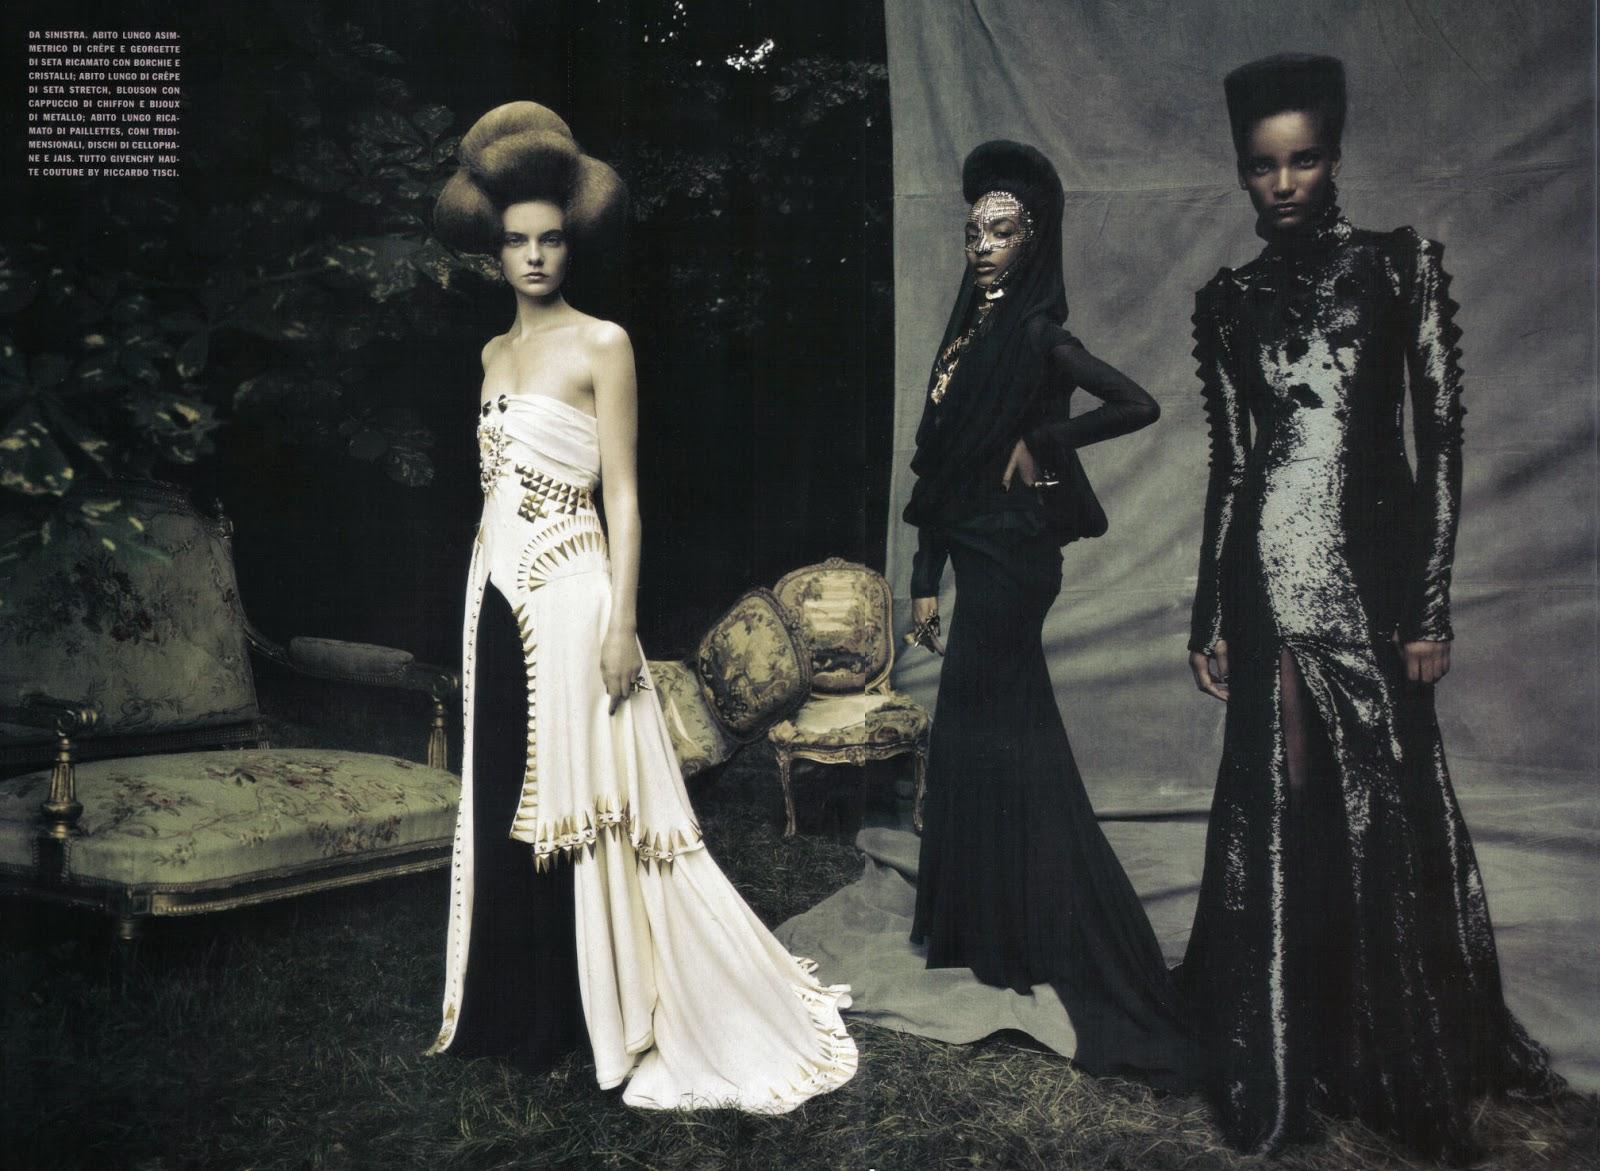 Viktoriya Sasonkina, Jourdan Dunn & Rose Cordero in 'A Dream of a Dress' by Paolo Roversi for Vogue Italia September 2009 | Ses Rêveries